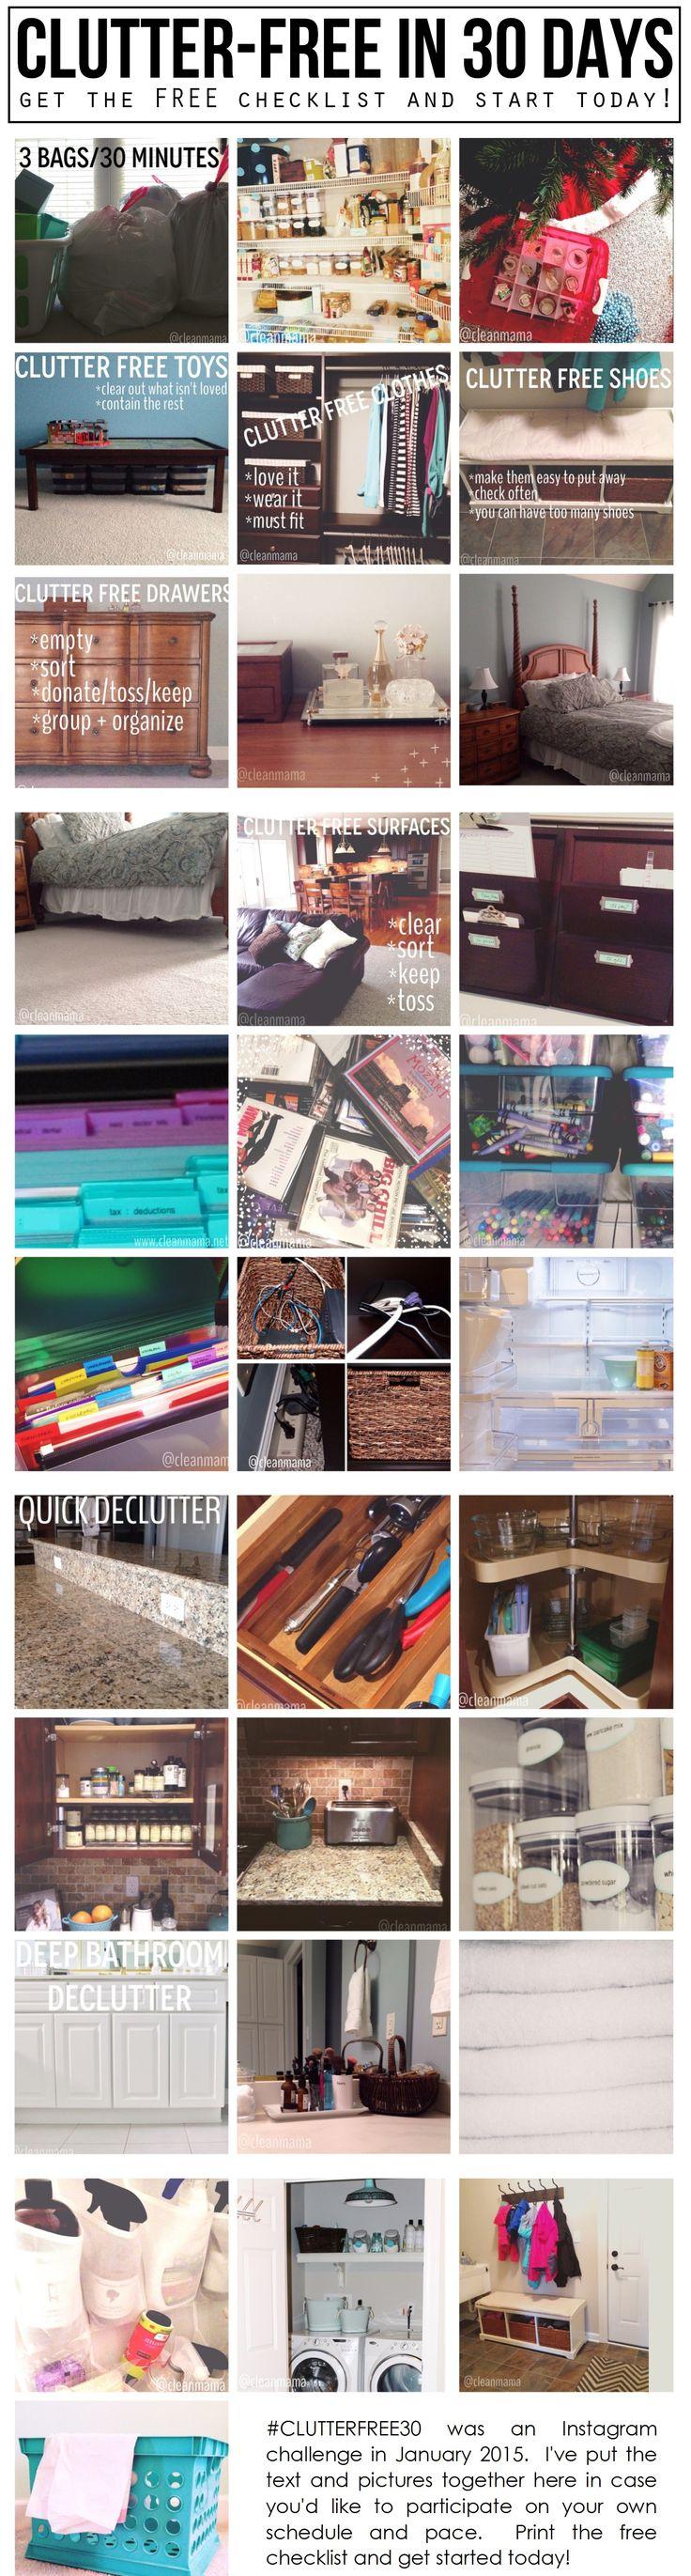 265 best images about pop art on pinterest batman pop for Best way to get rid of clutter